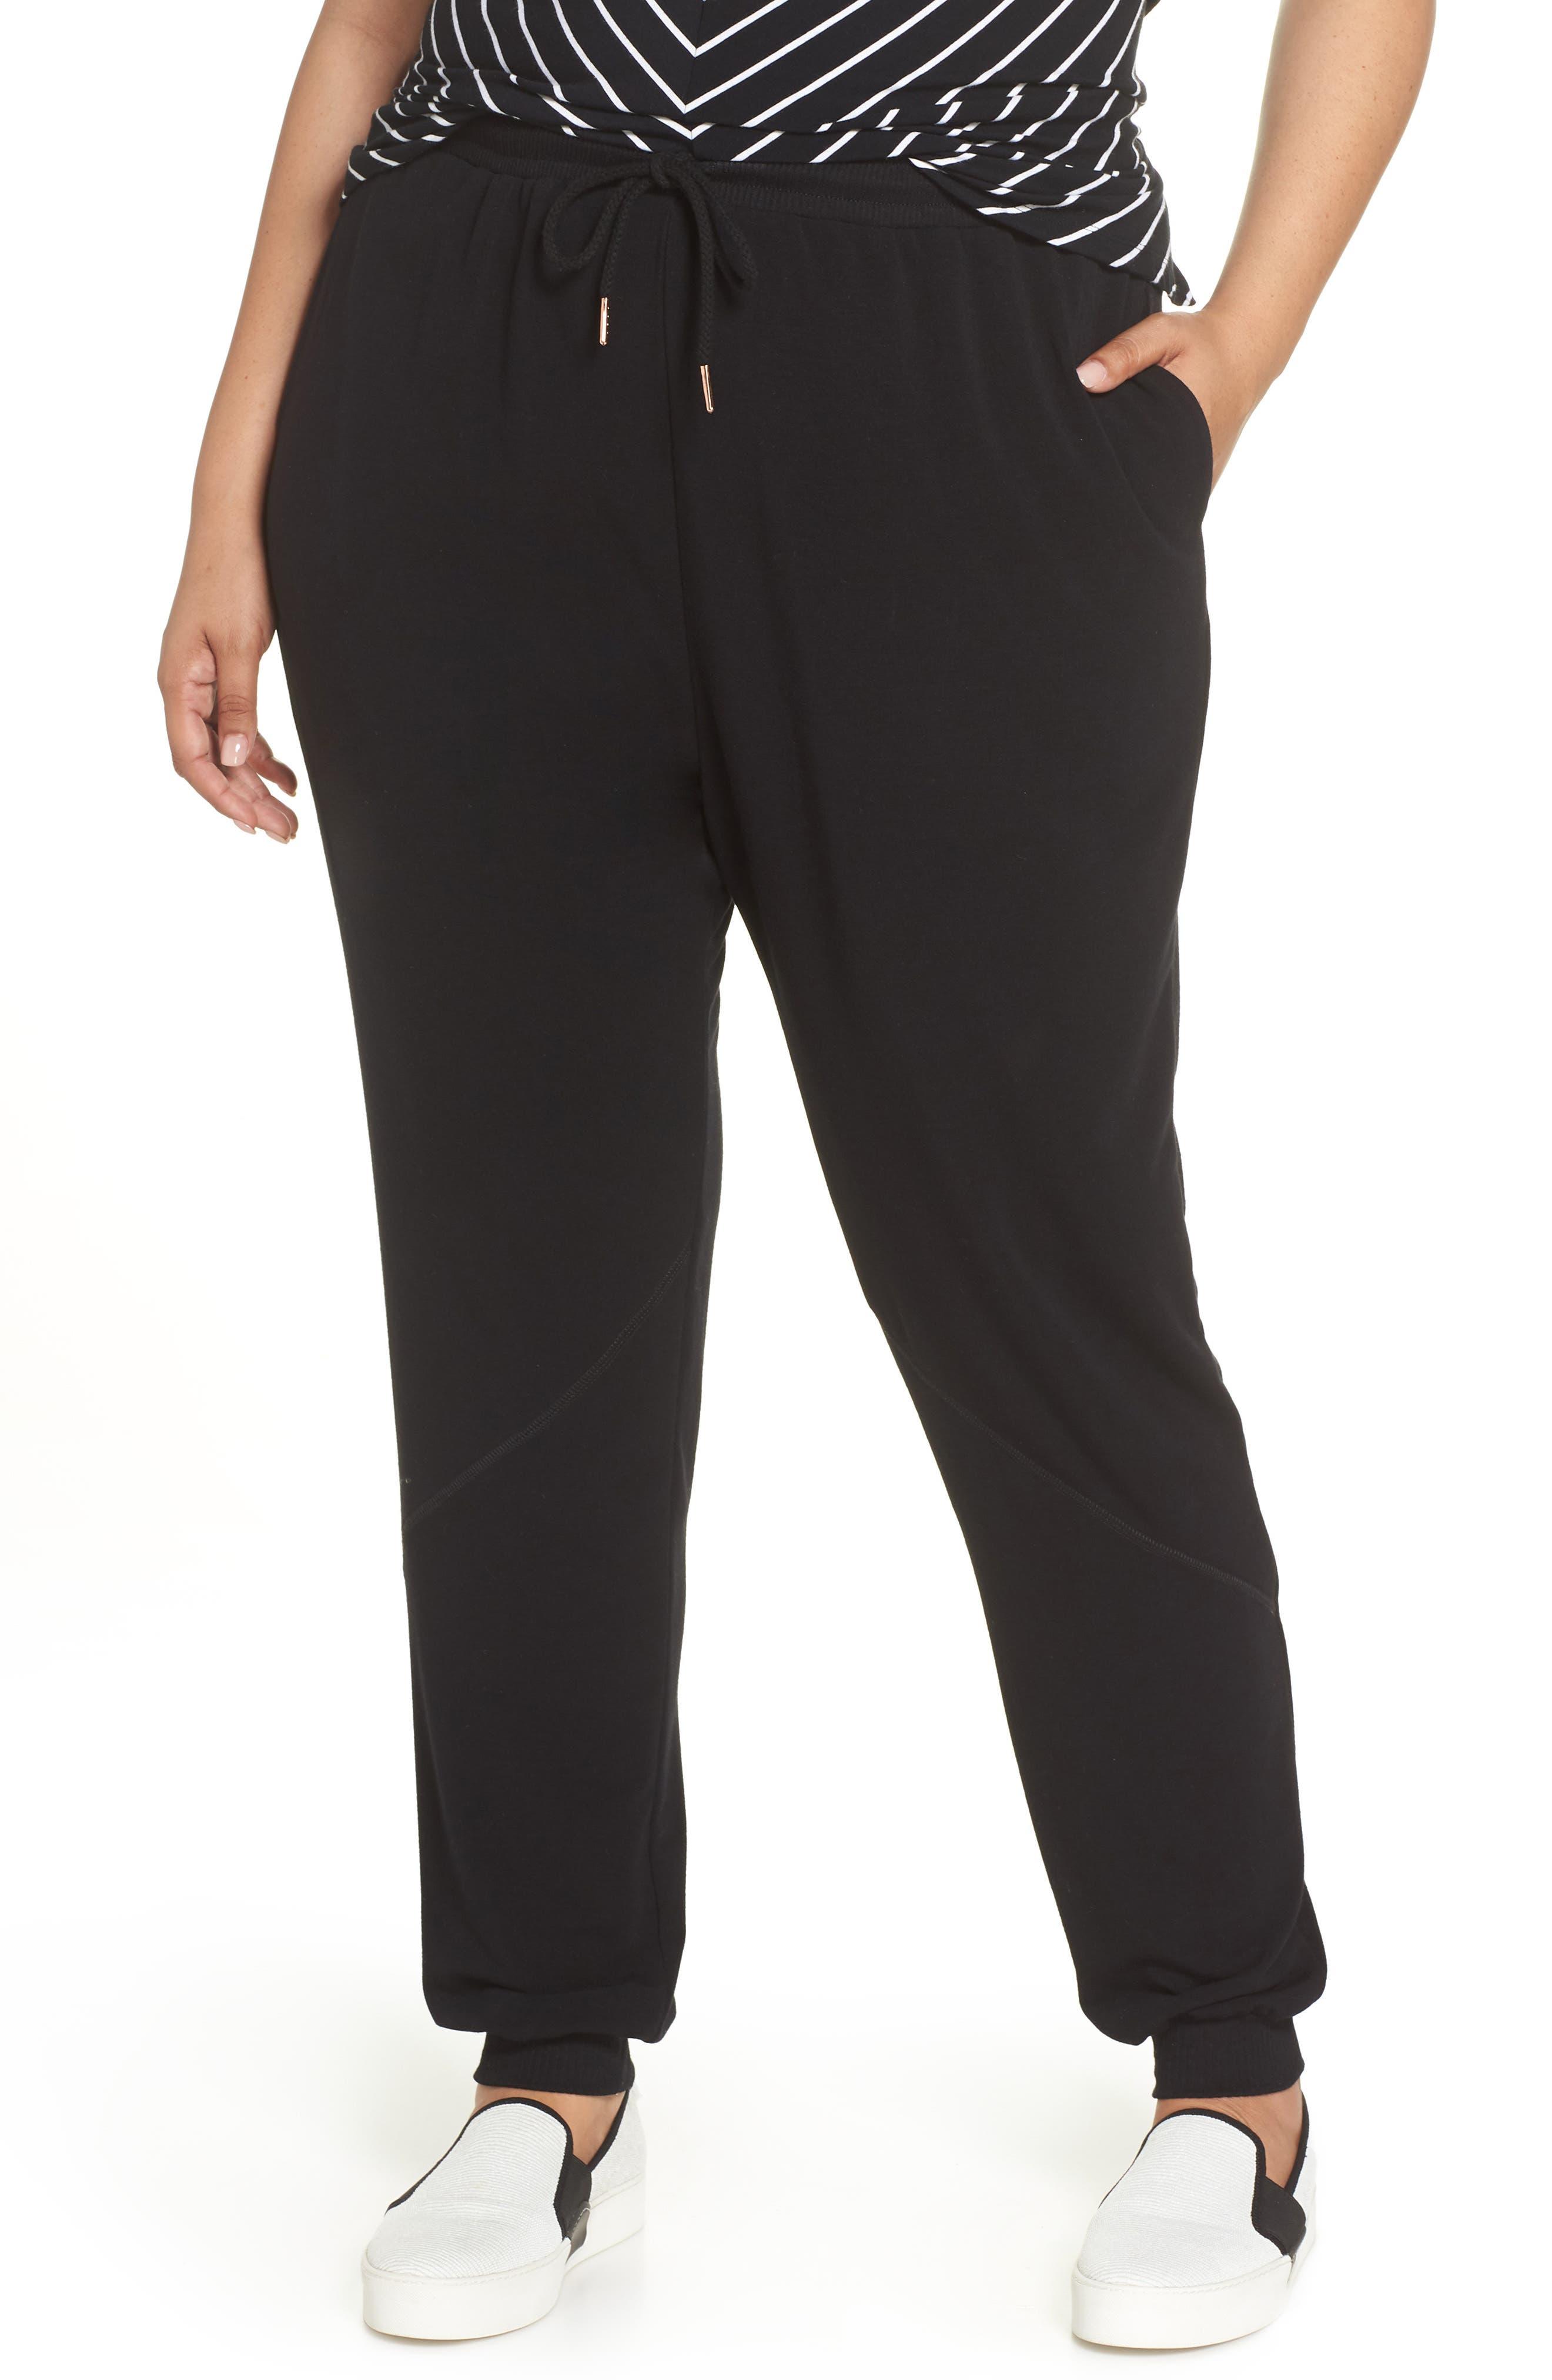 Jogger Pants,                         Main,                         color, Black